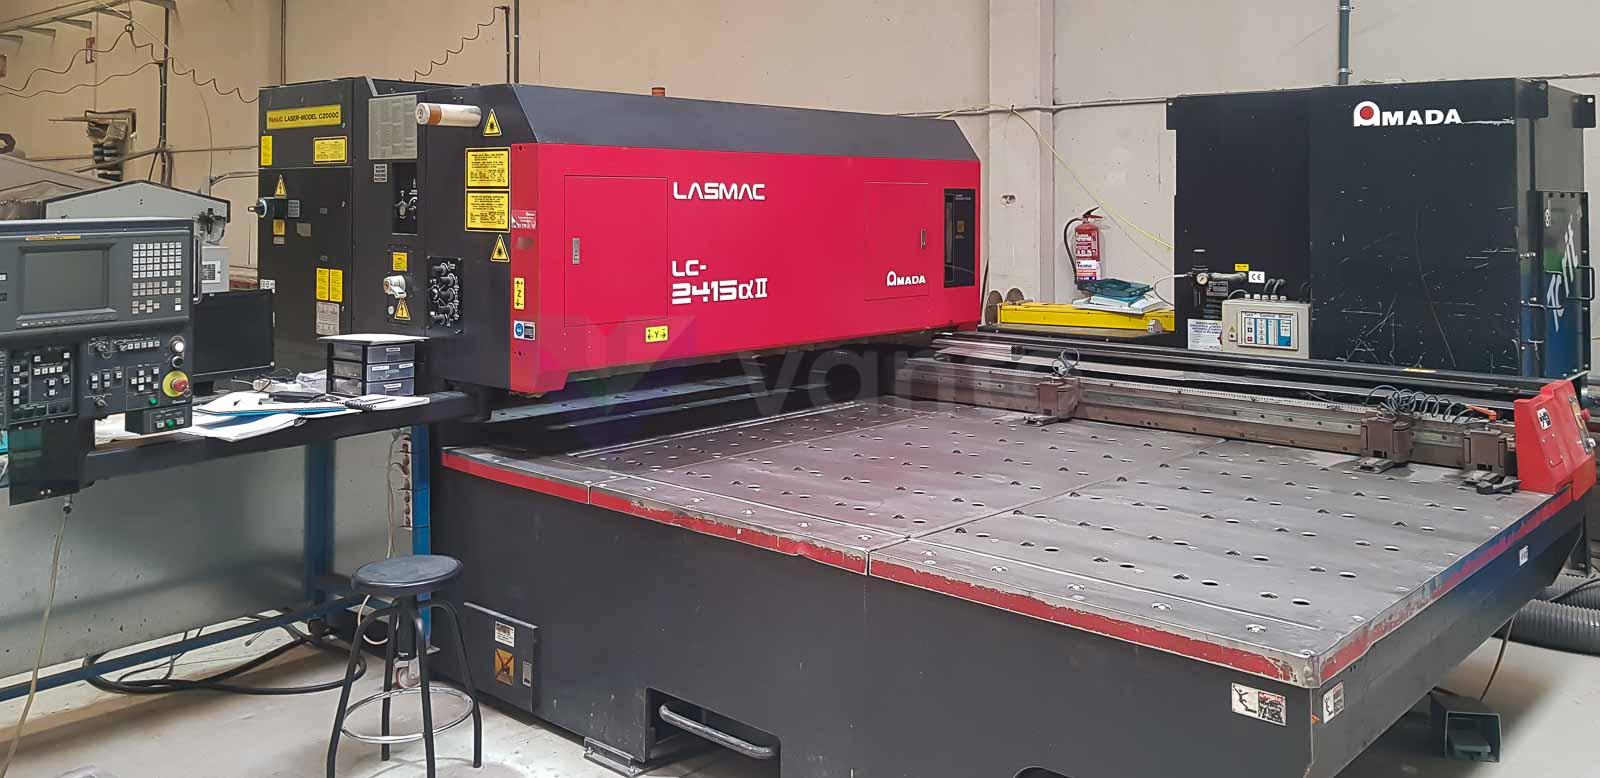 AMADA LC 2415 ALPHA II Laser cutting machine (CO2) (1998) id10591